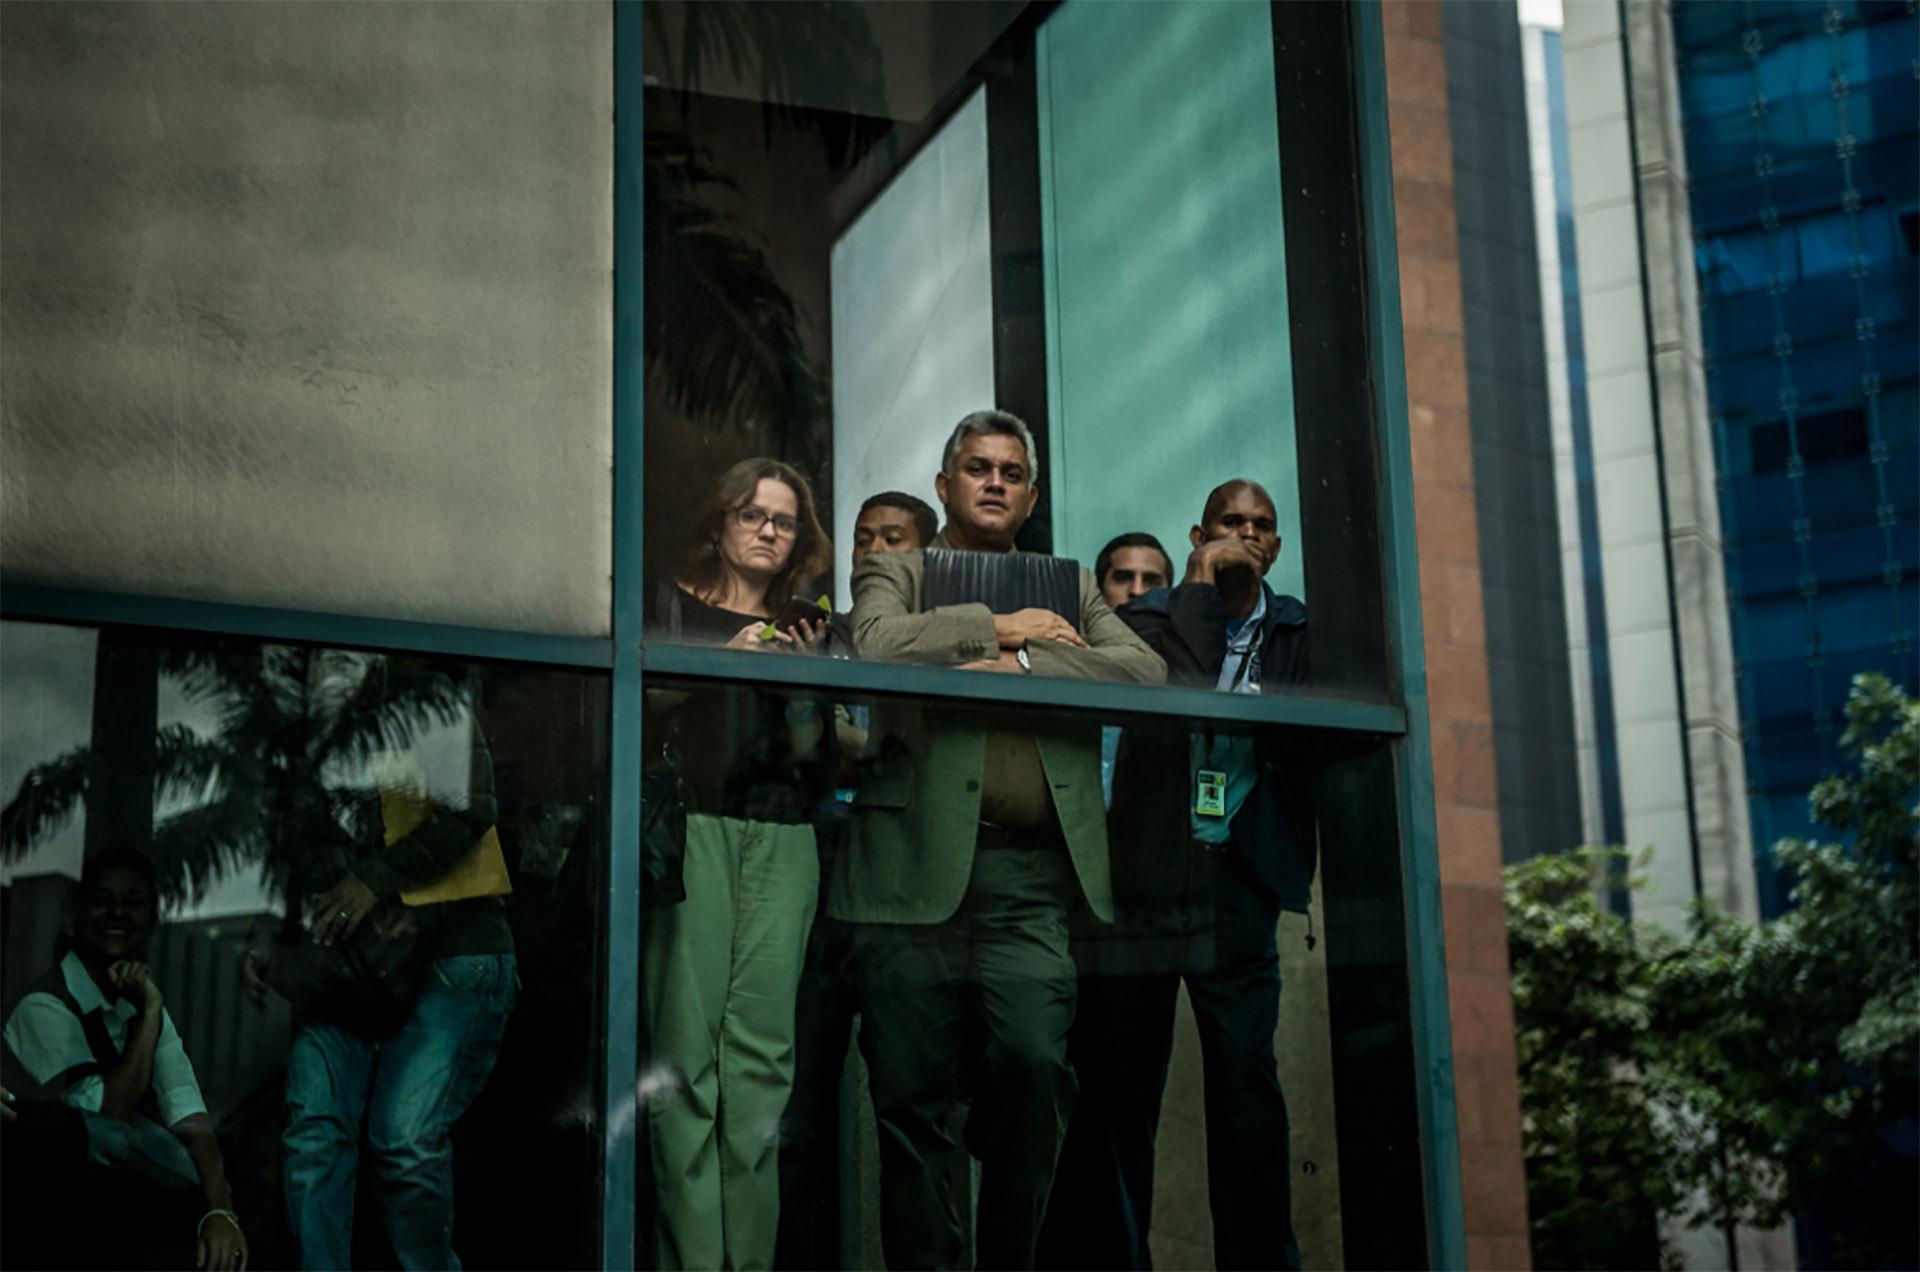 Oficinistas observan los disturbios en Caracas (Meridith Kohut for The New York Times)